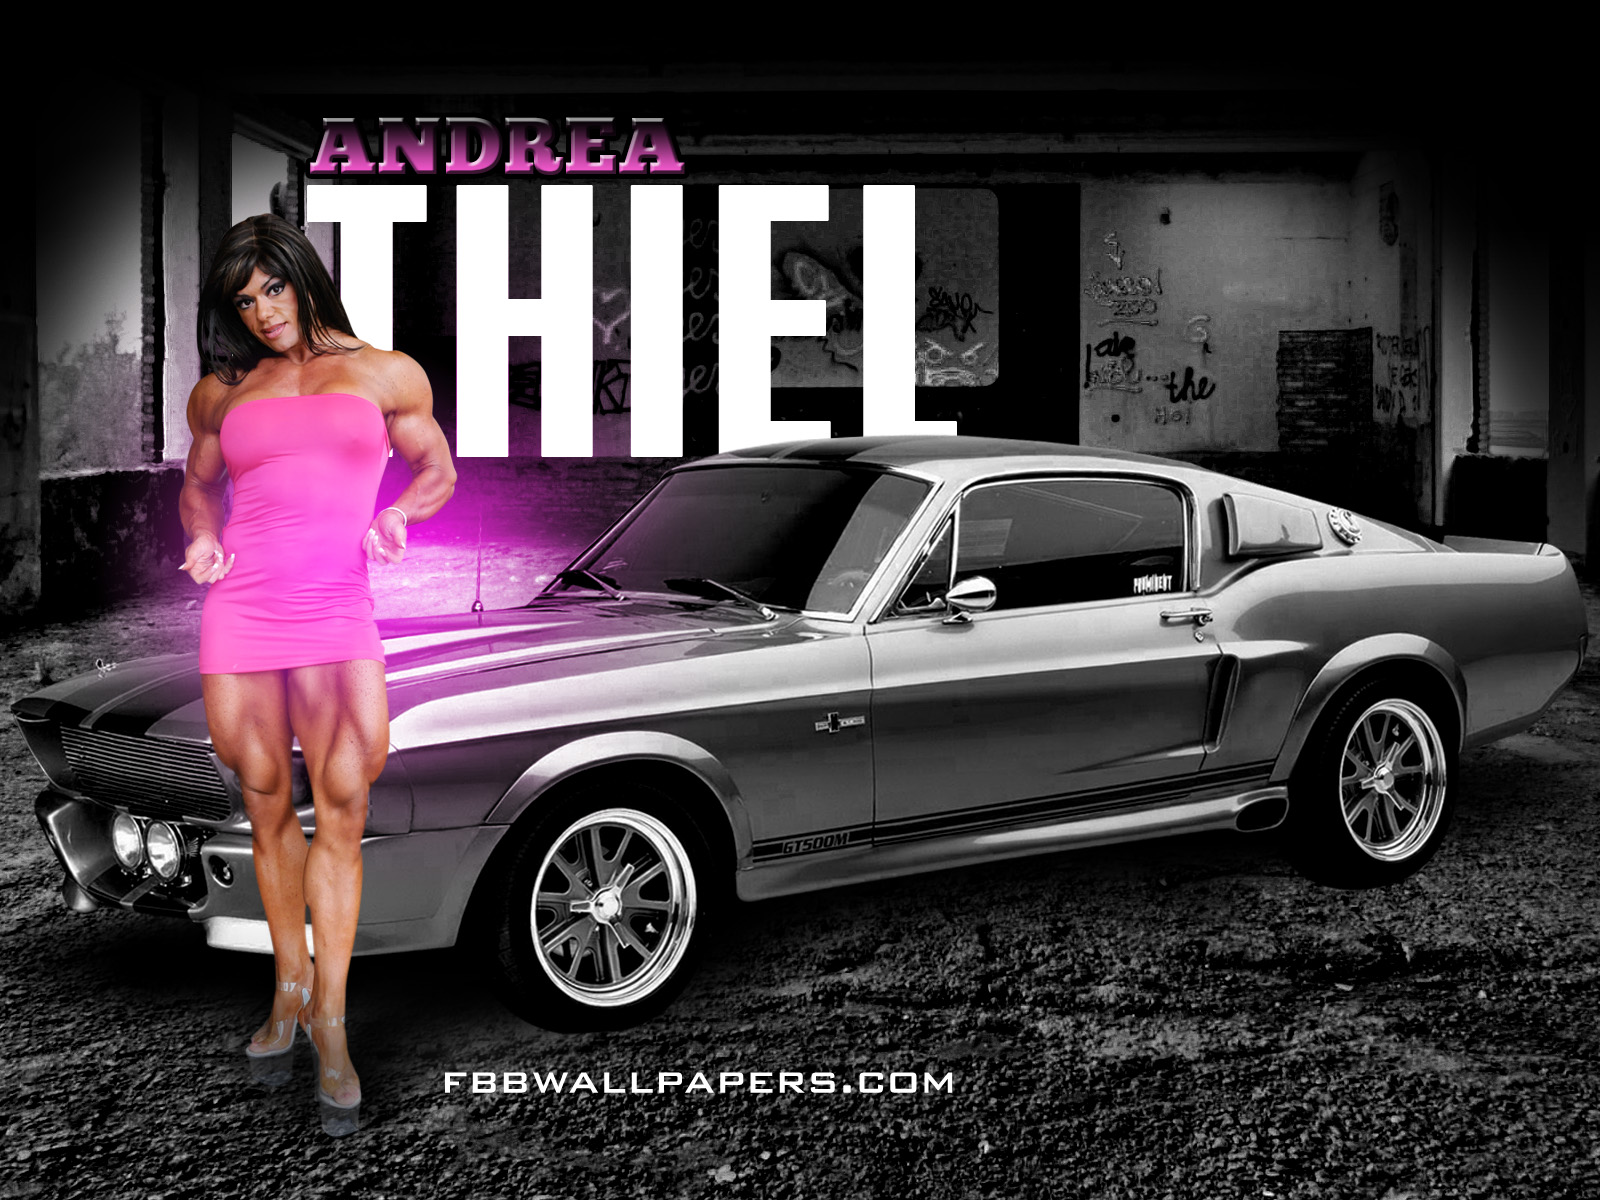 http://1.bp.blogspot.com/-mSvVn3x4xl0/Td0uCGiPeqI/AAAAAAAAEqU/TuMAX2qhFjk/s1600/andie_thiel_1600by1200.jpg